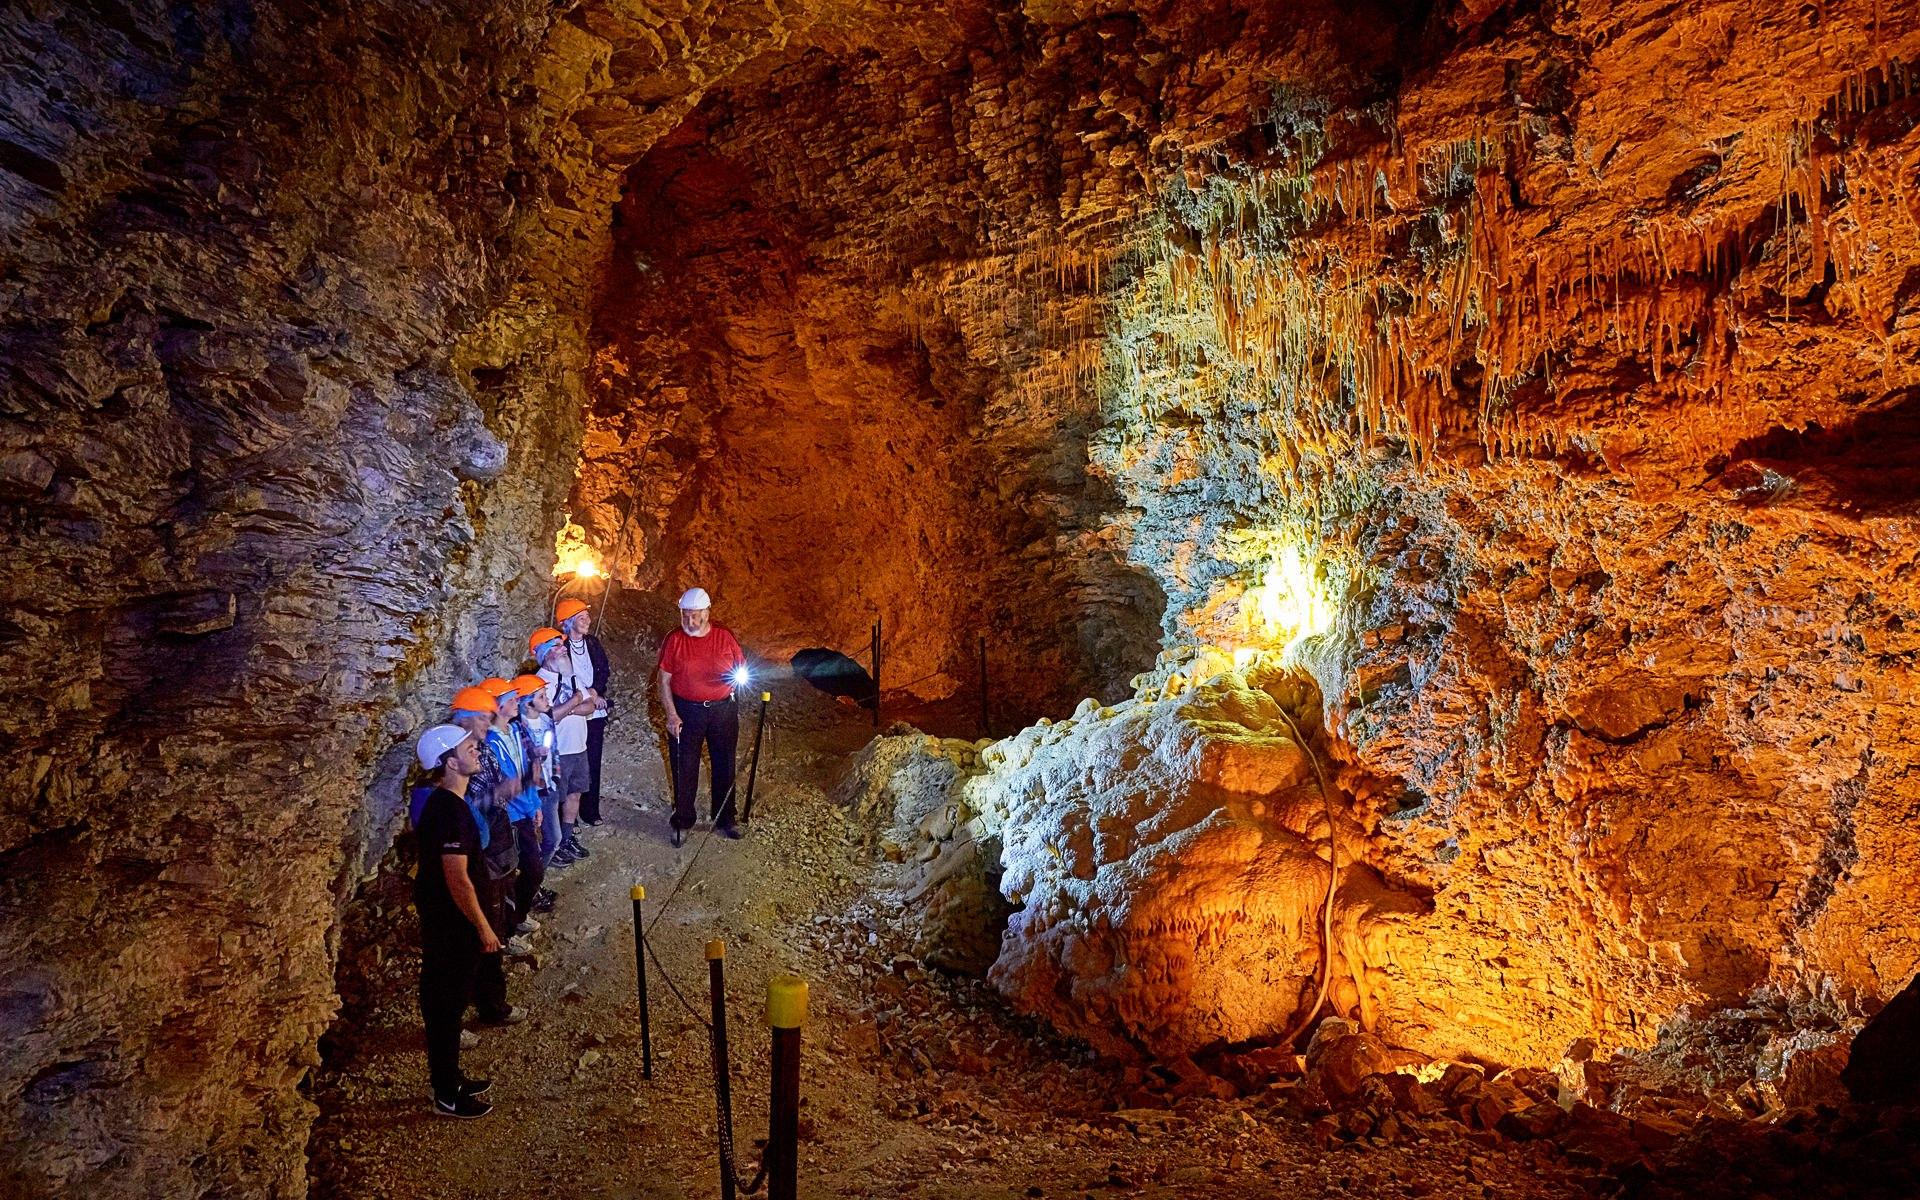 caves-kaikoura-cave-tour-01